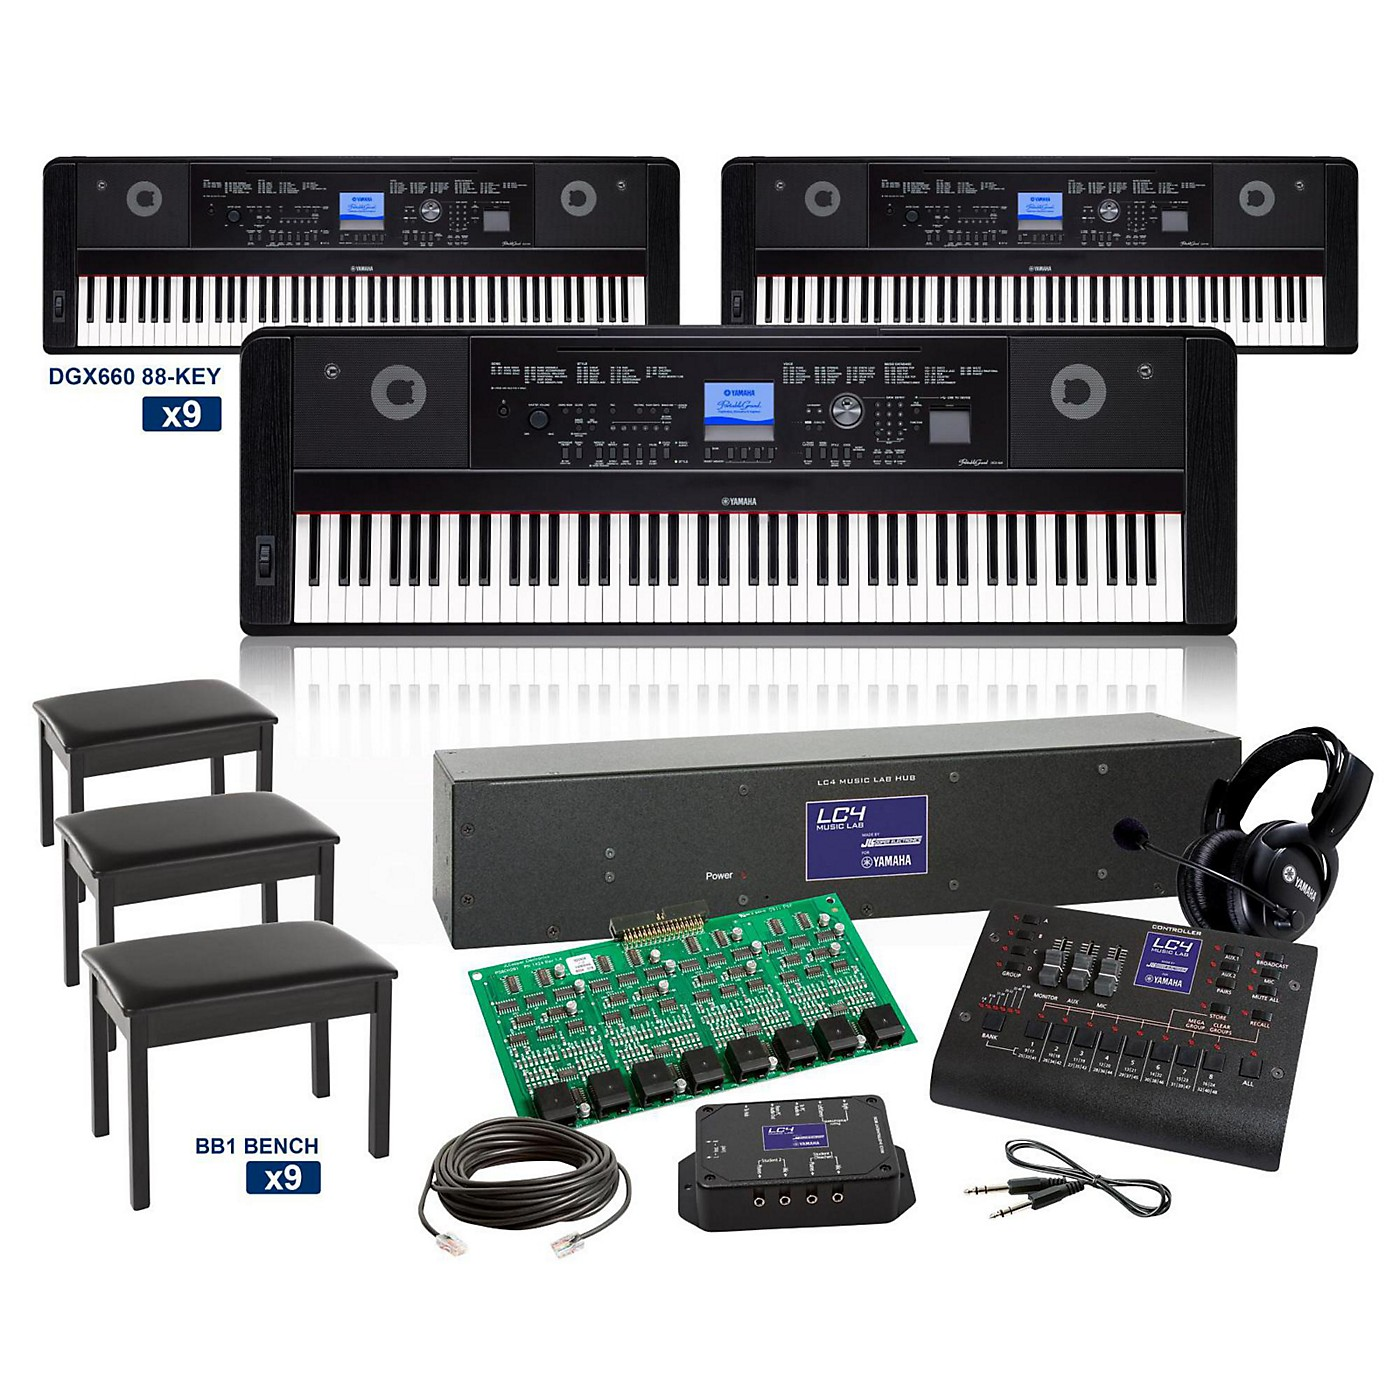 Yamaha DGX660 88-key Grand LC4 Keyboard Lab thumbnail